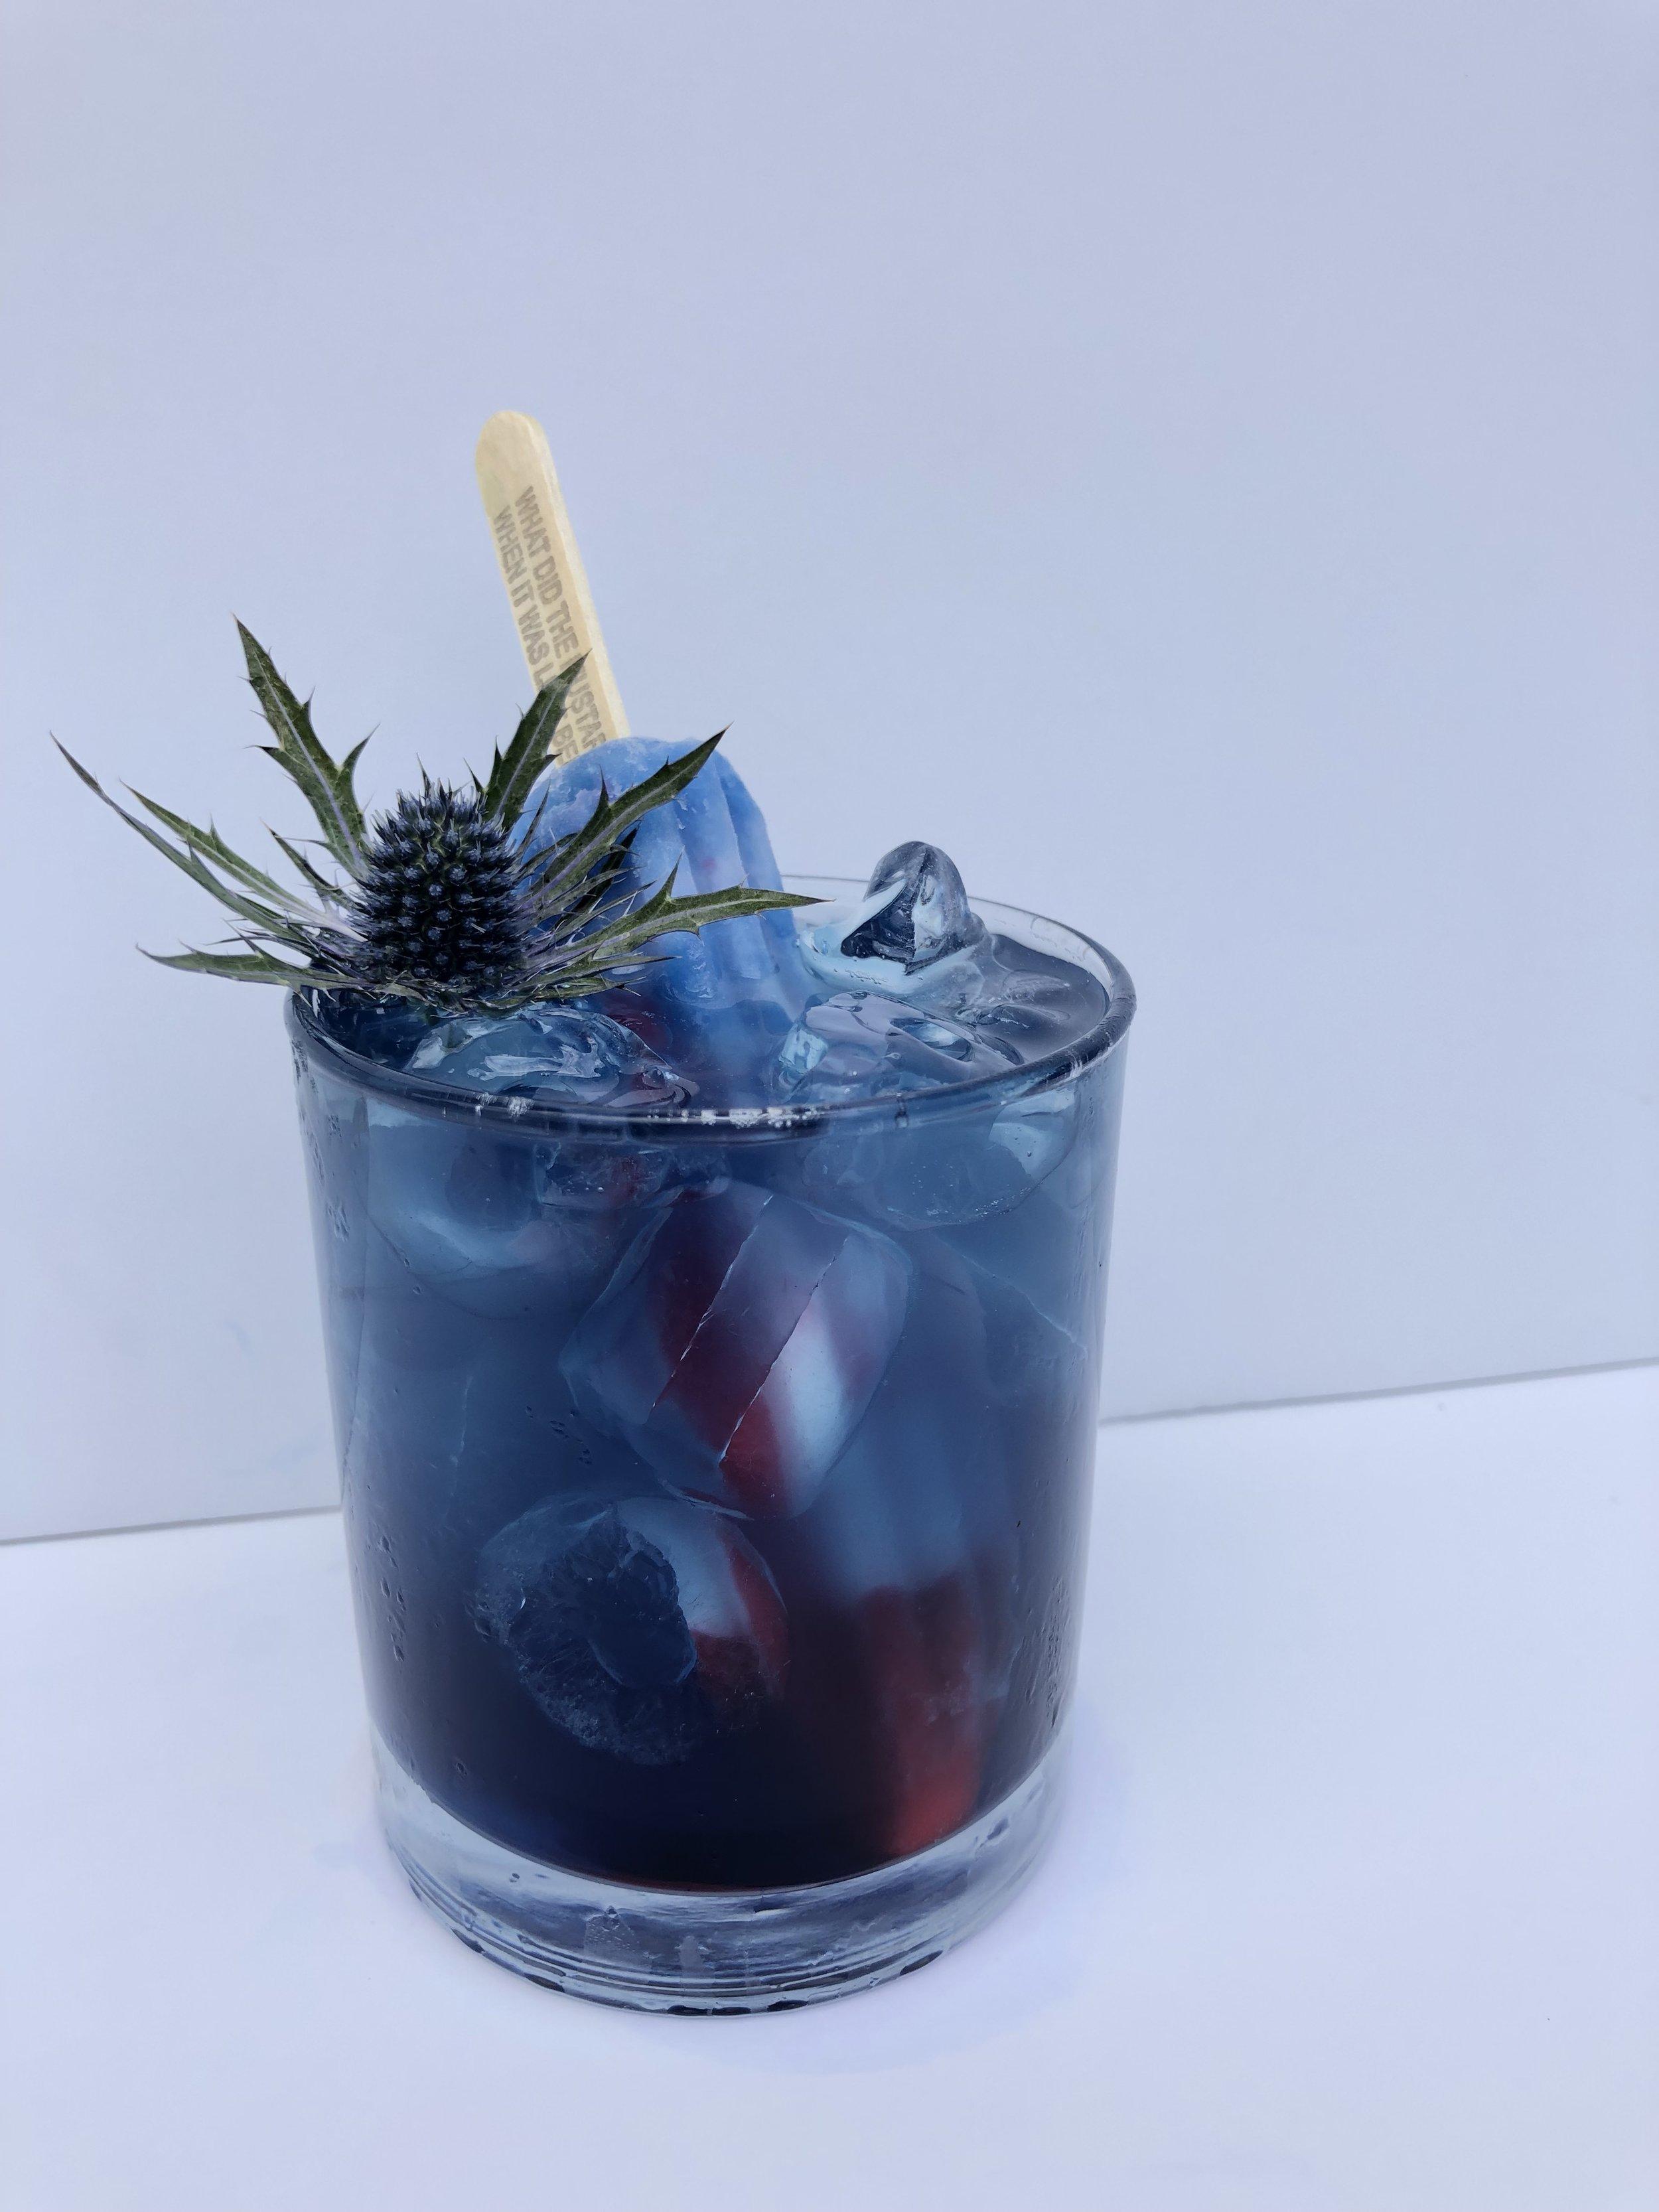 The Bomb.com - Splash of Blue Curacao2 1/2 oz BacardiTop with Cherry LemonadeServe over ice.Add Bomb Pop.